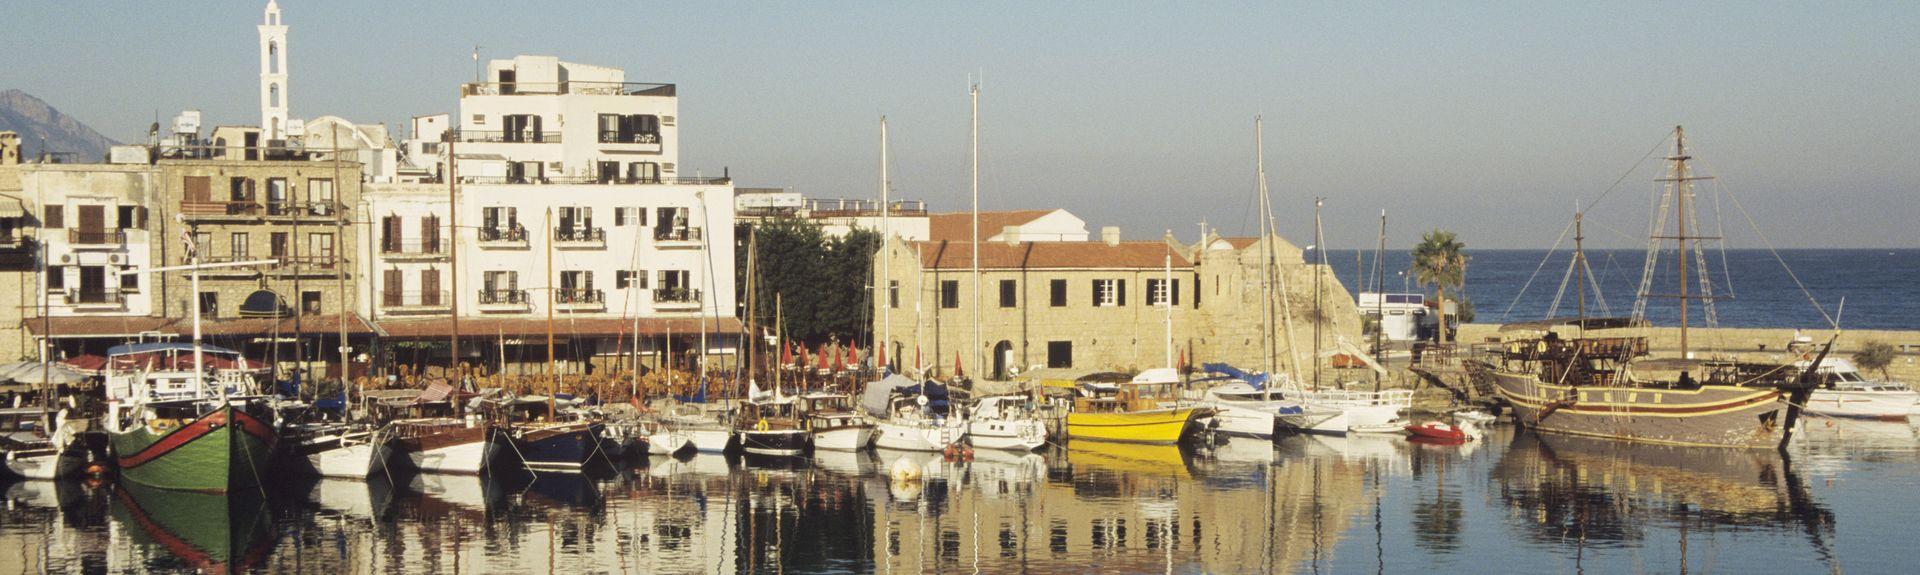 Girne, Cypr